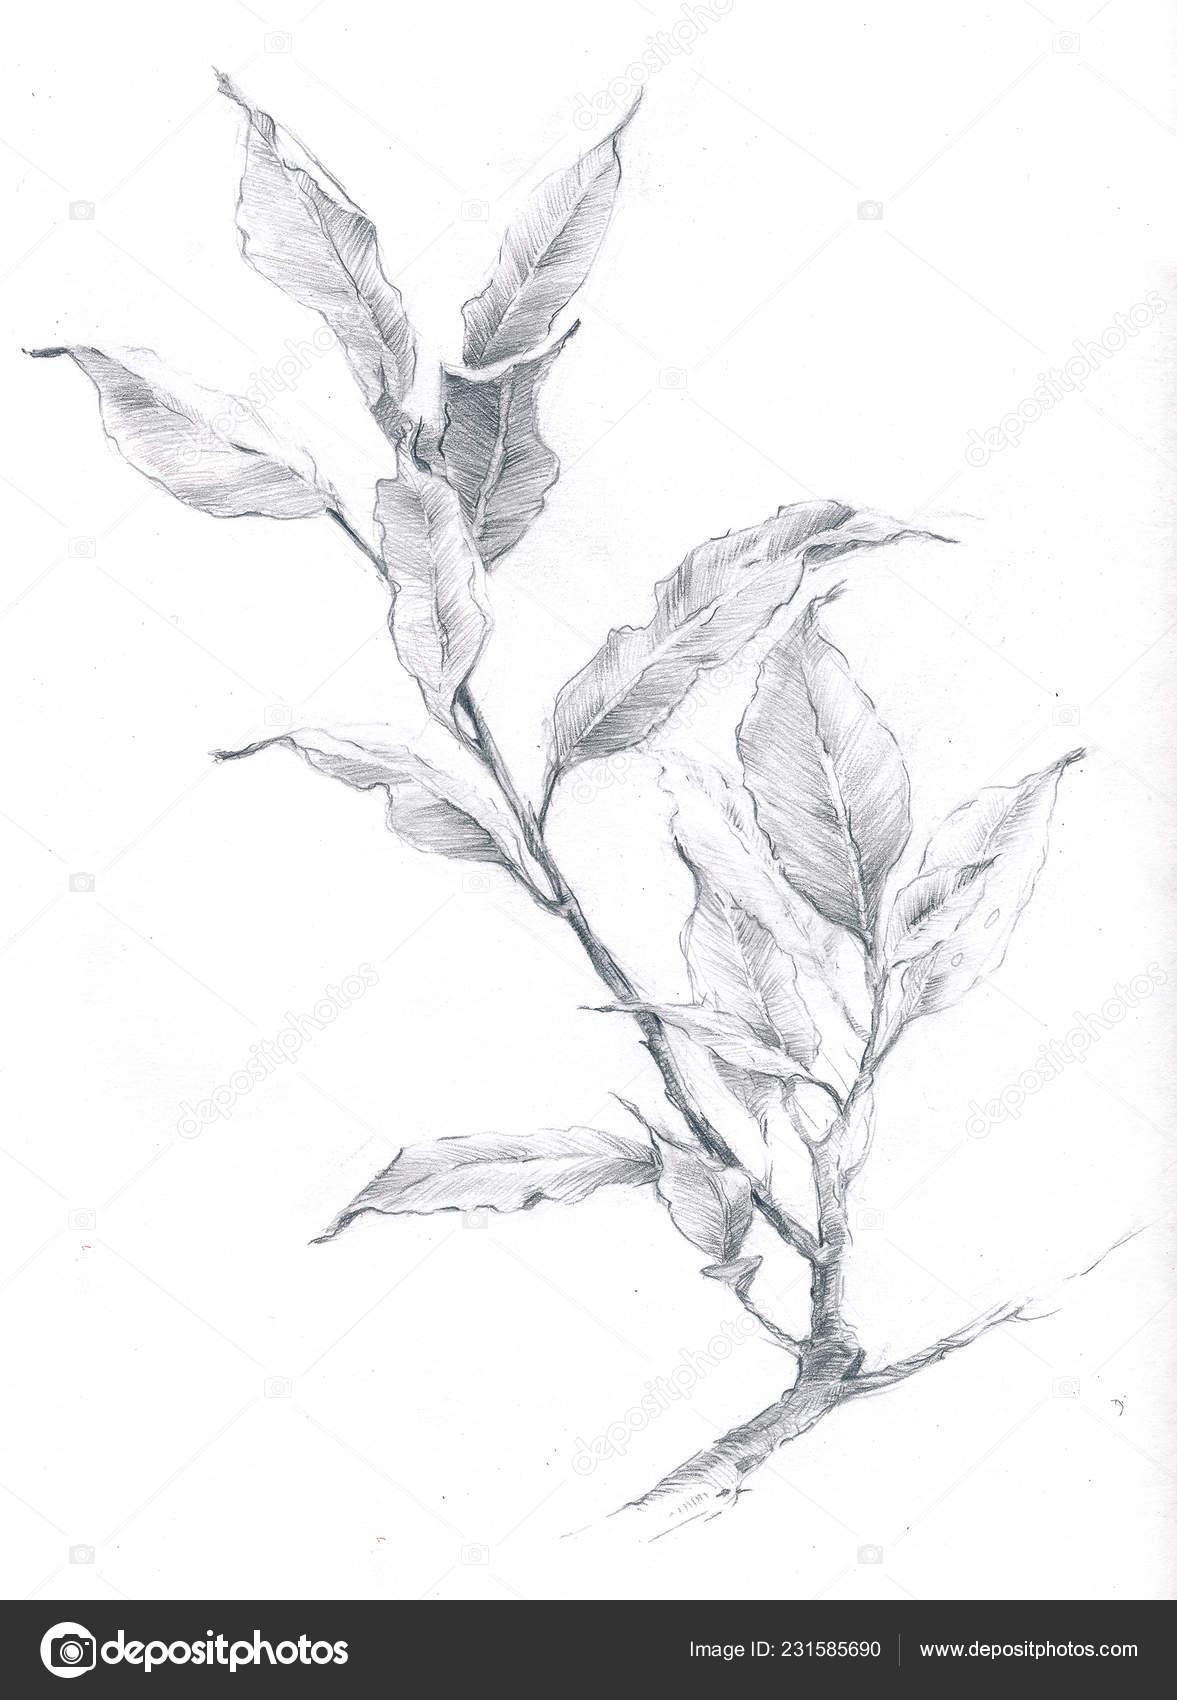 Botanical illustration of a pencil sketch of a laurel branch stock image